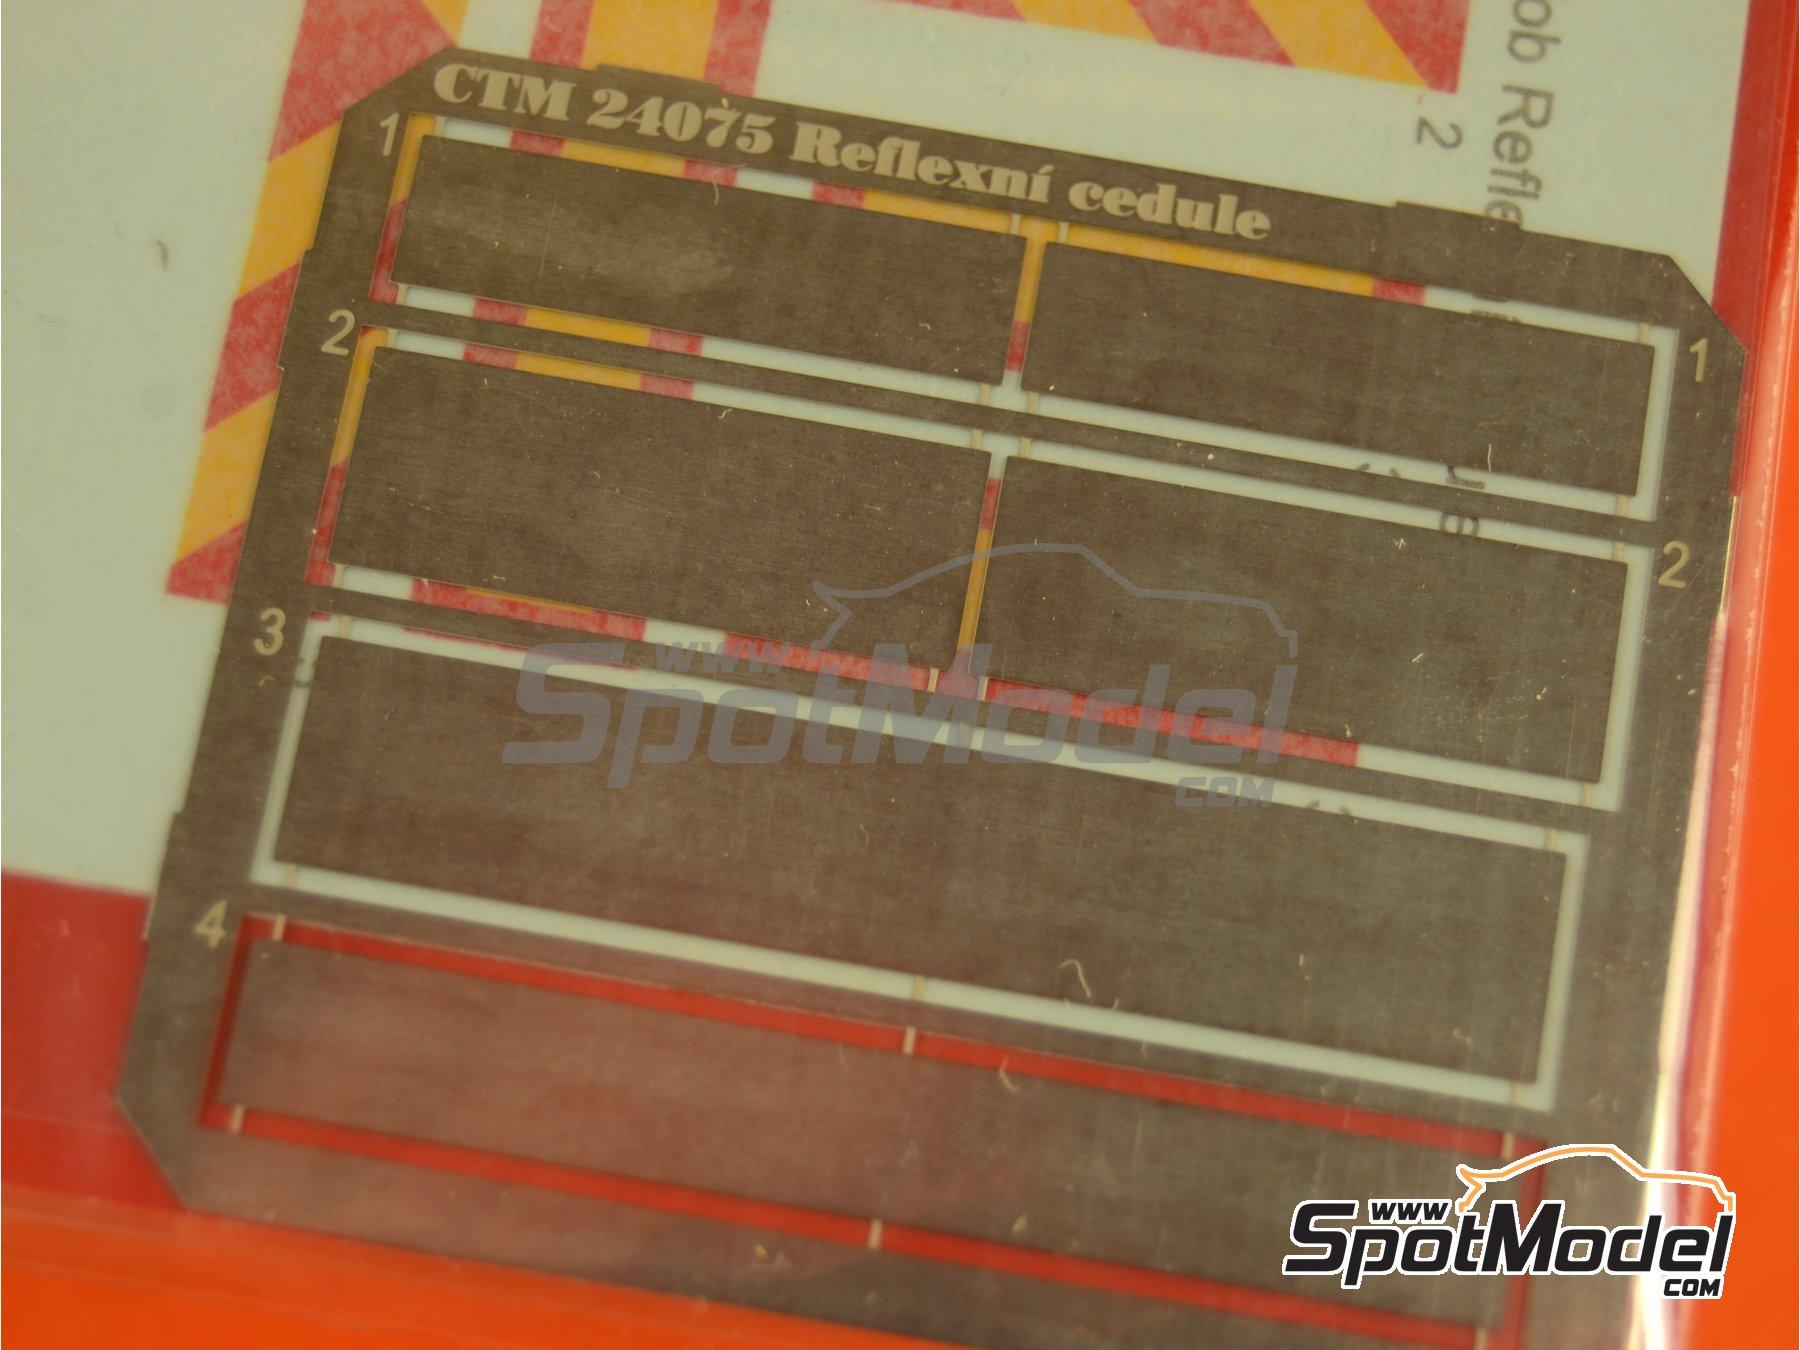 Image 2: Placas reflectantes traseras tipo ECE R 70 | Mejora en escala1/24 fabricado por Czech Truck Model (ref.CTM24075)